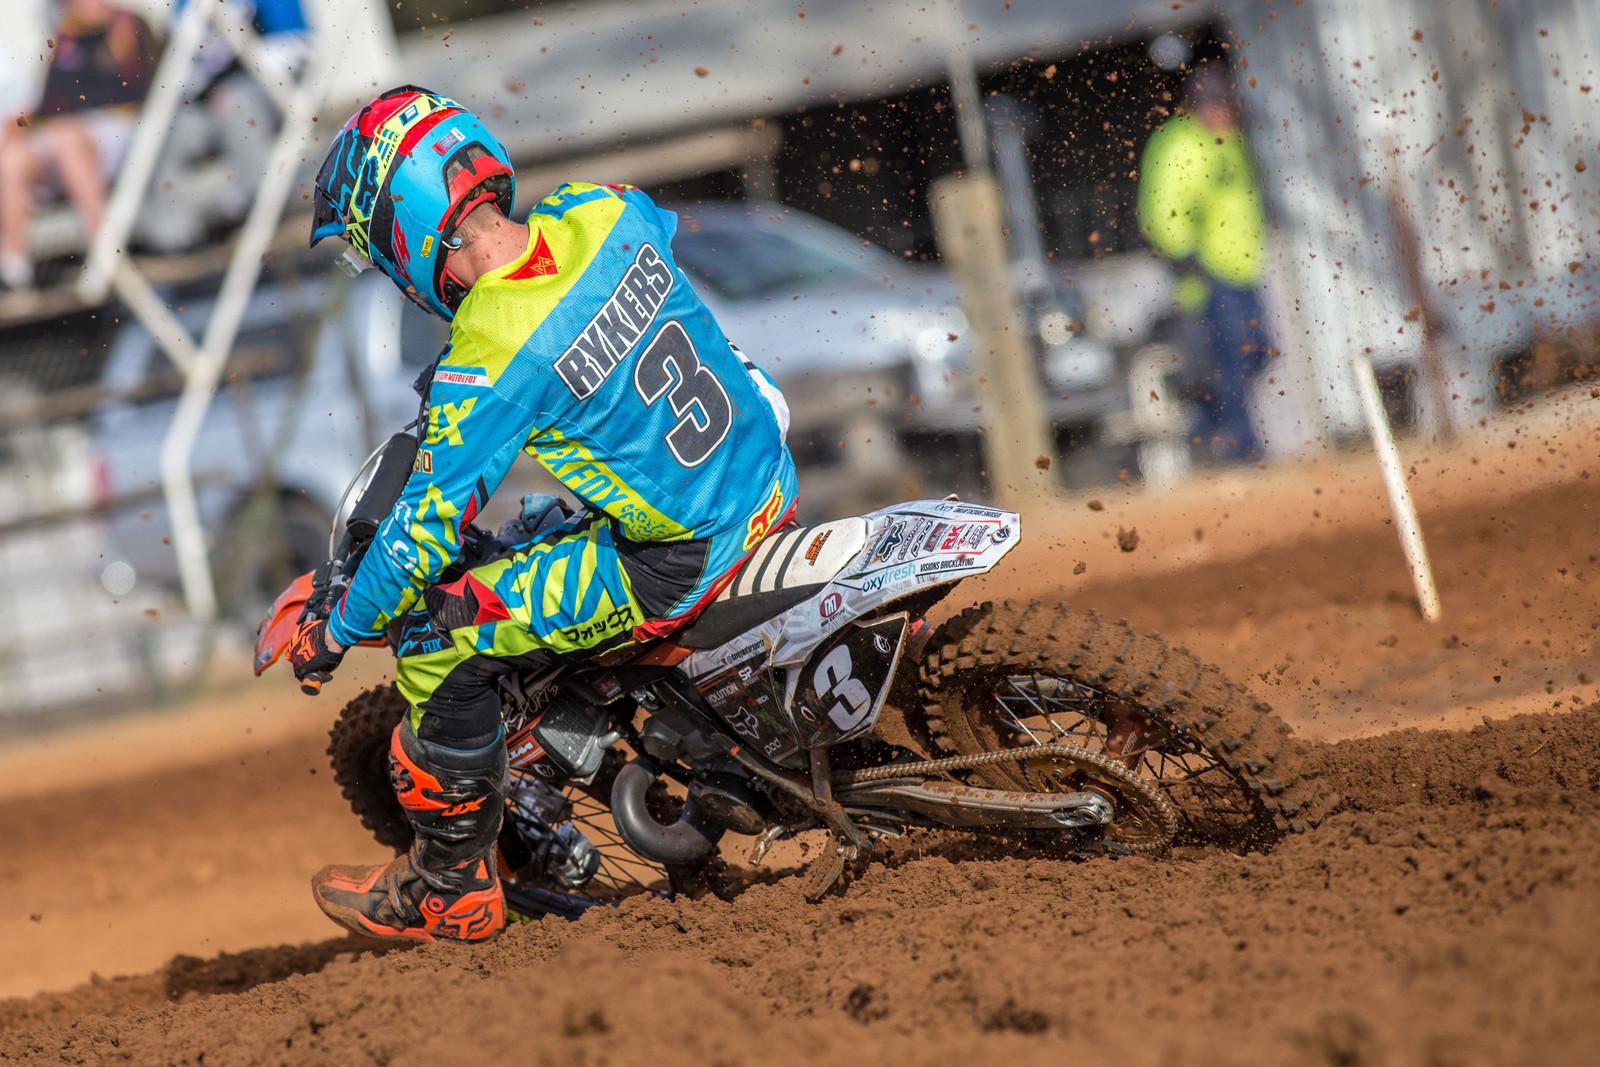 Jayden Reykers - Australian Motul Mx Championships: Round 4, Murray Bridge - Motocross Pictures - Vital MX